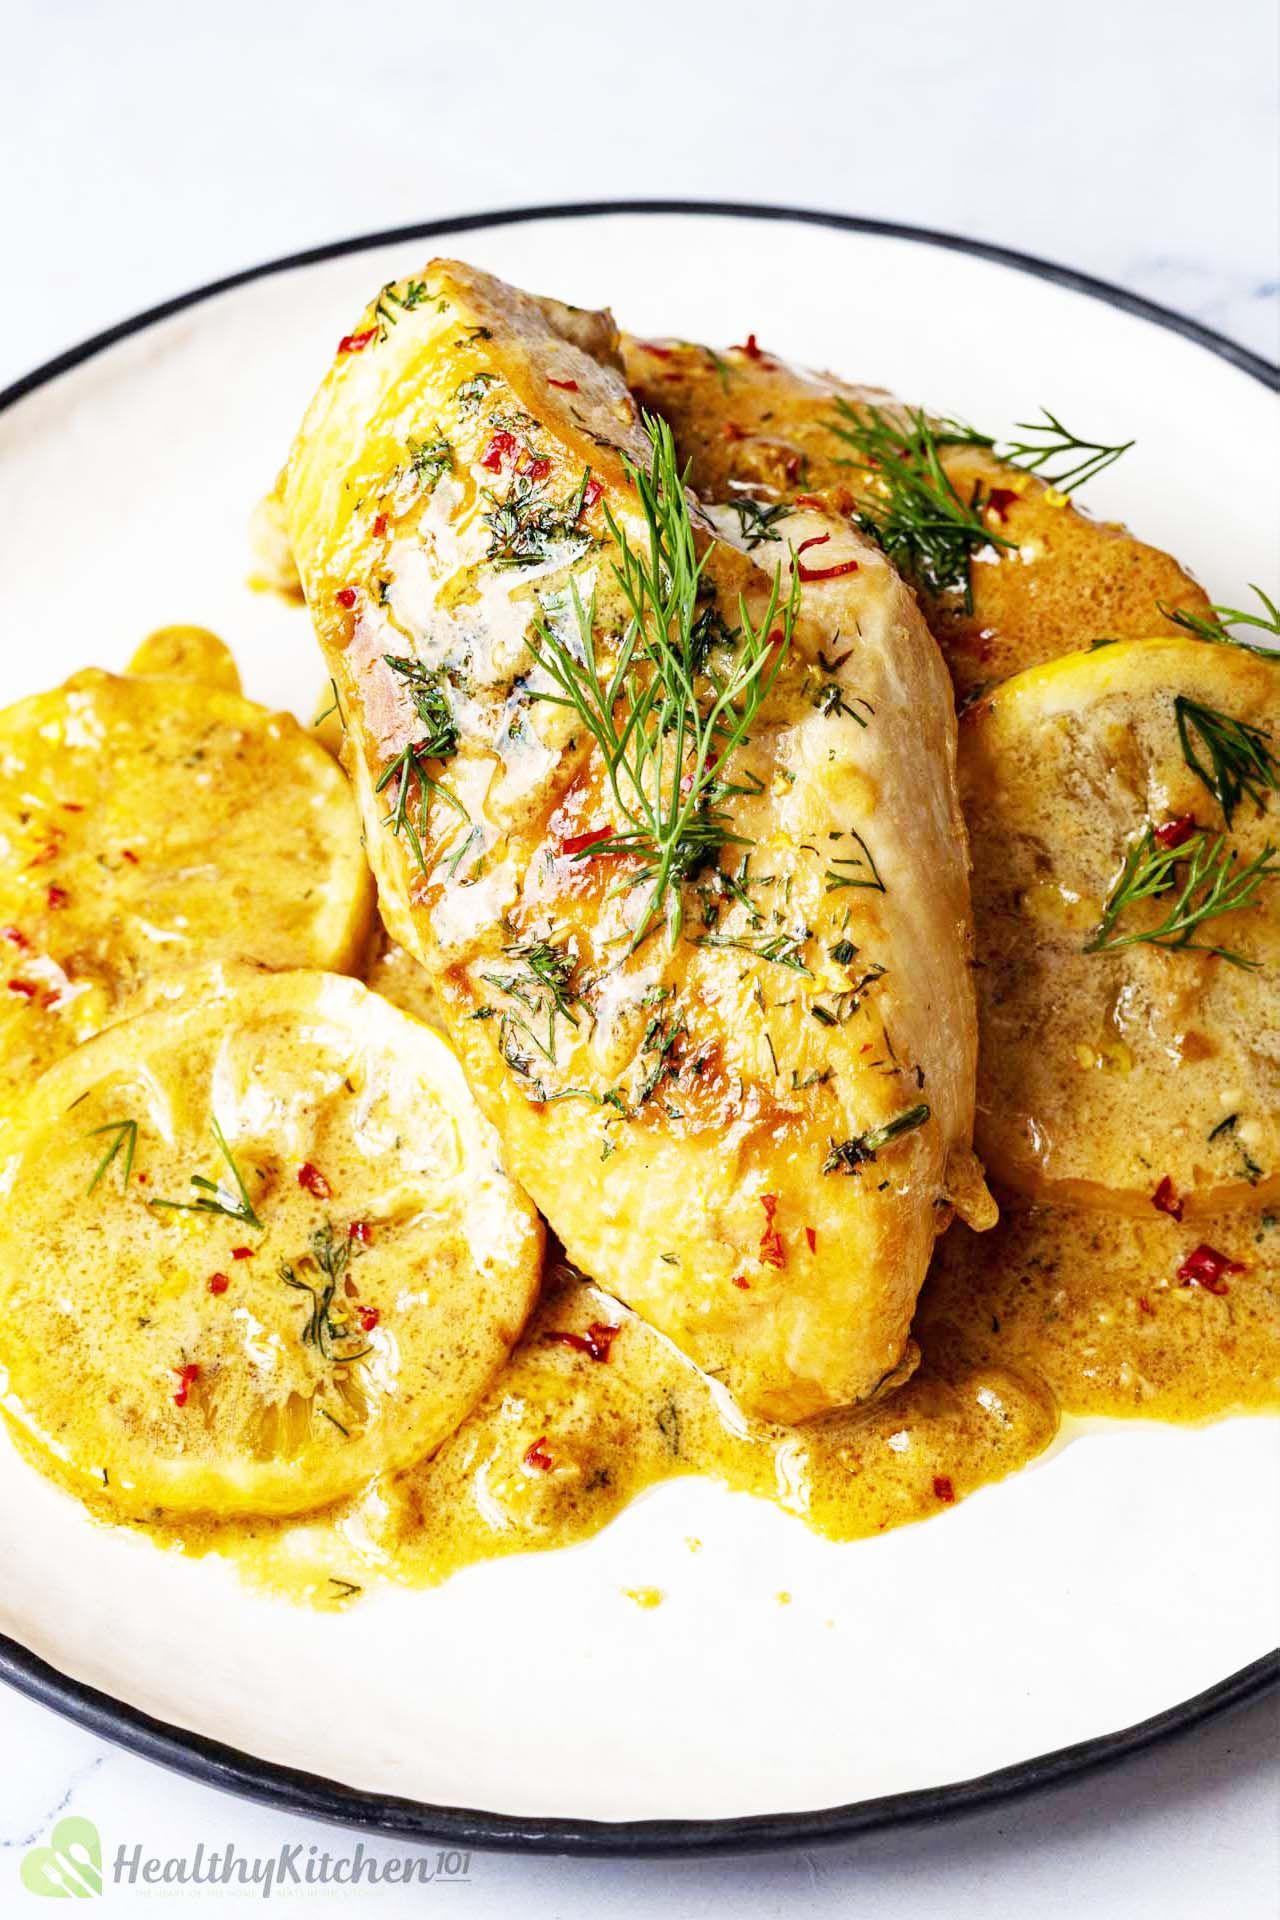 Is Lemon Chicken Healthy